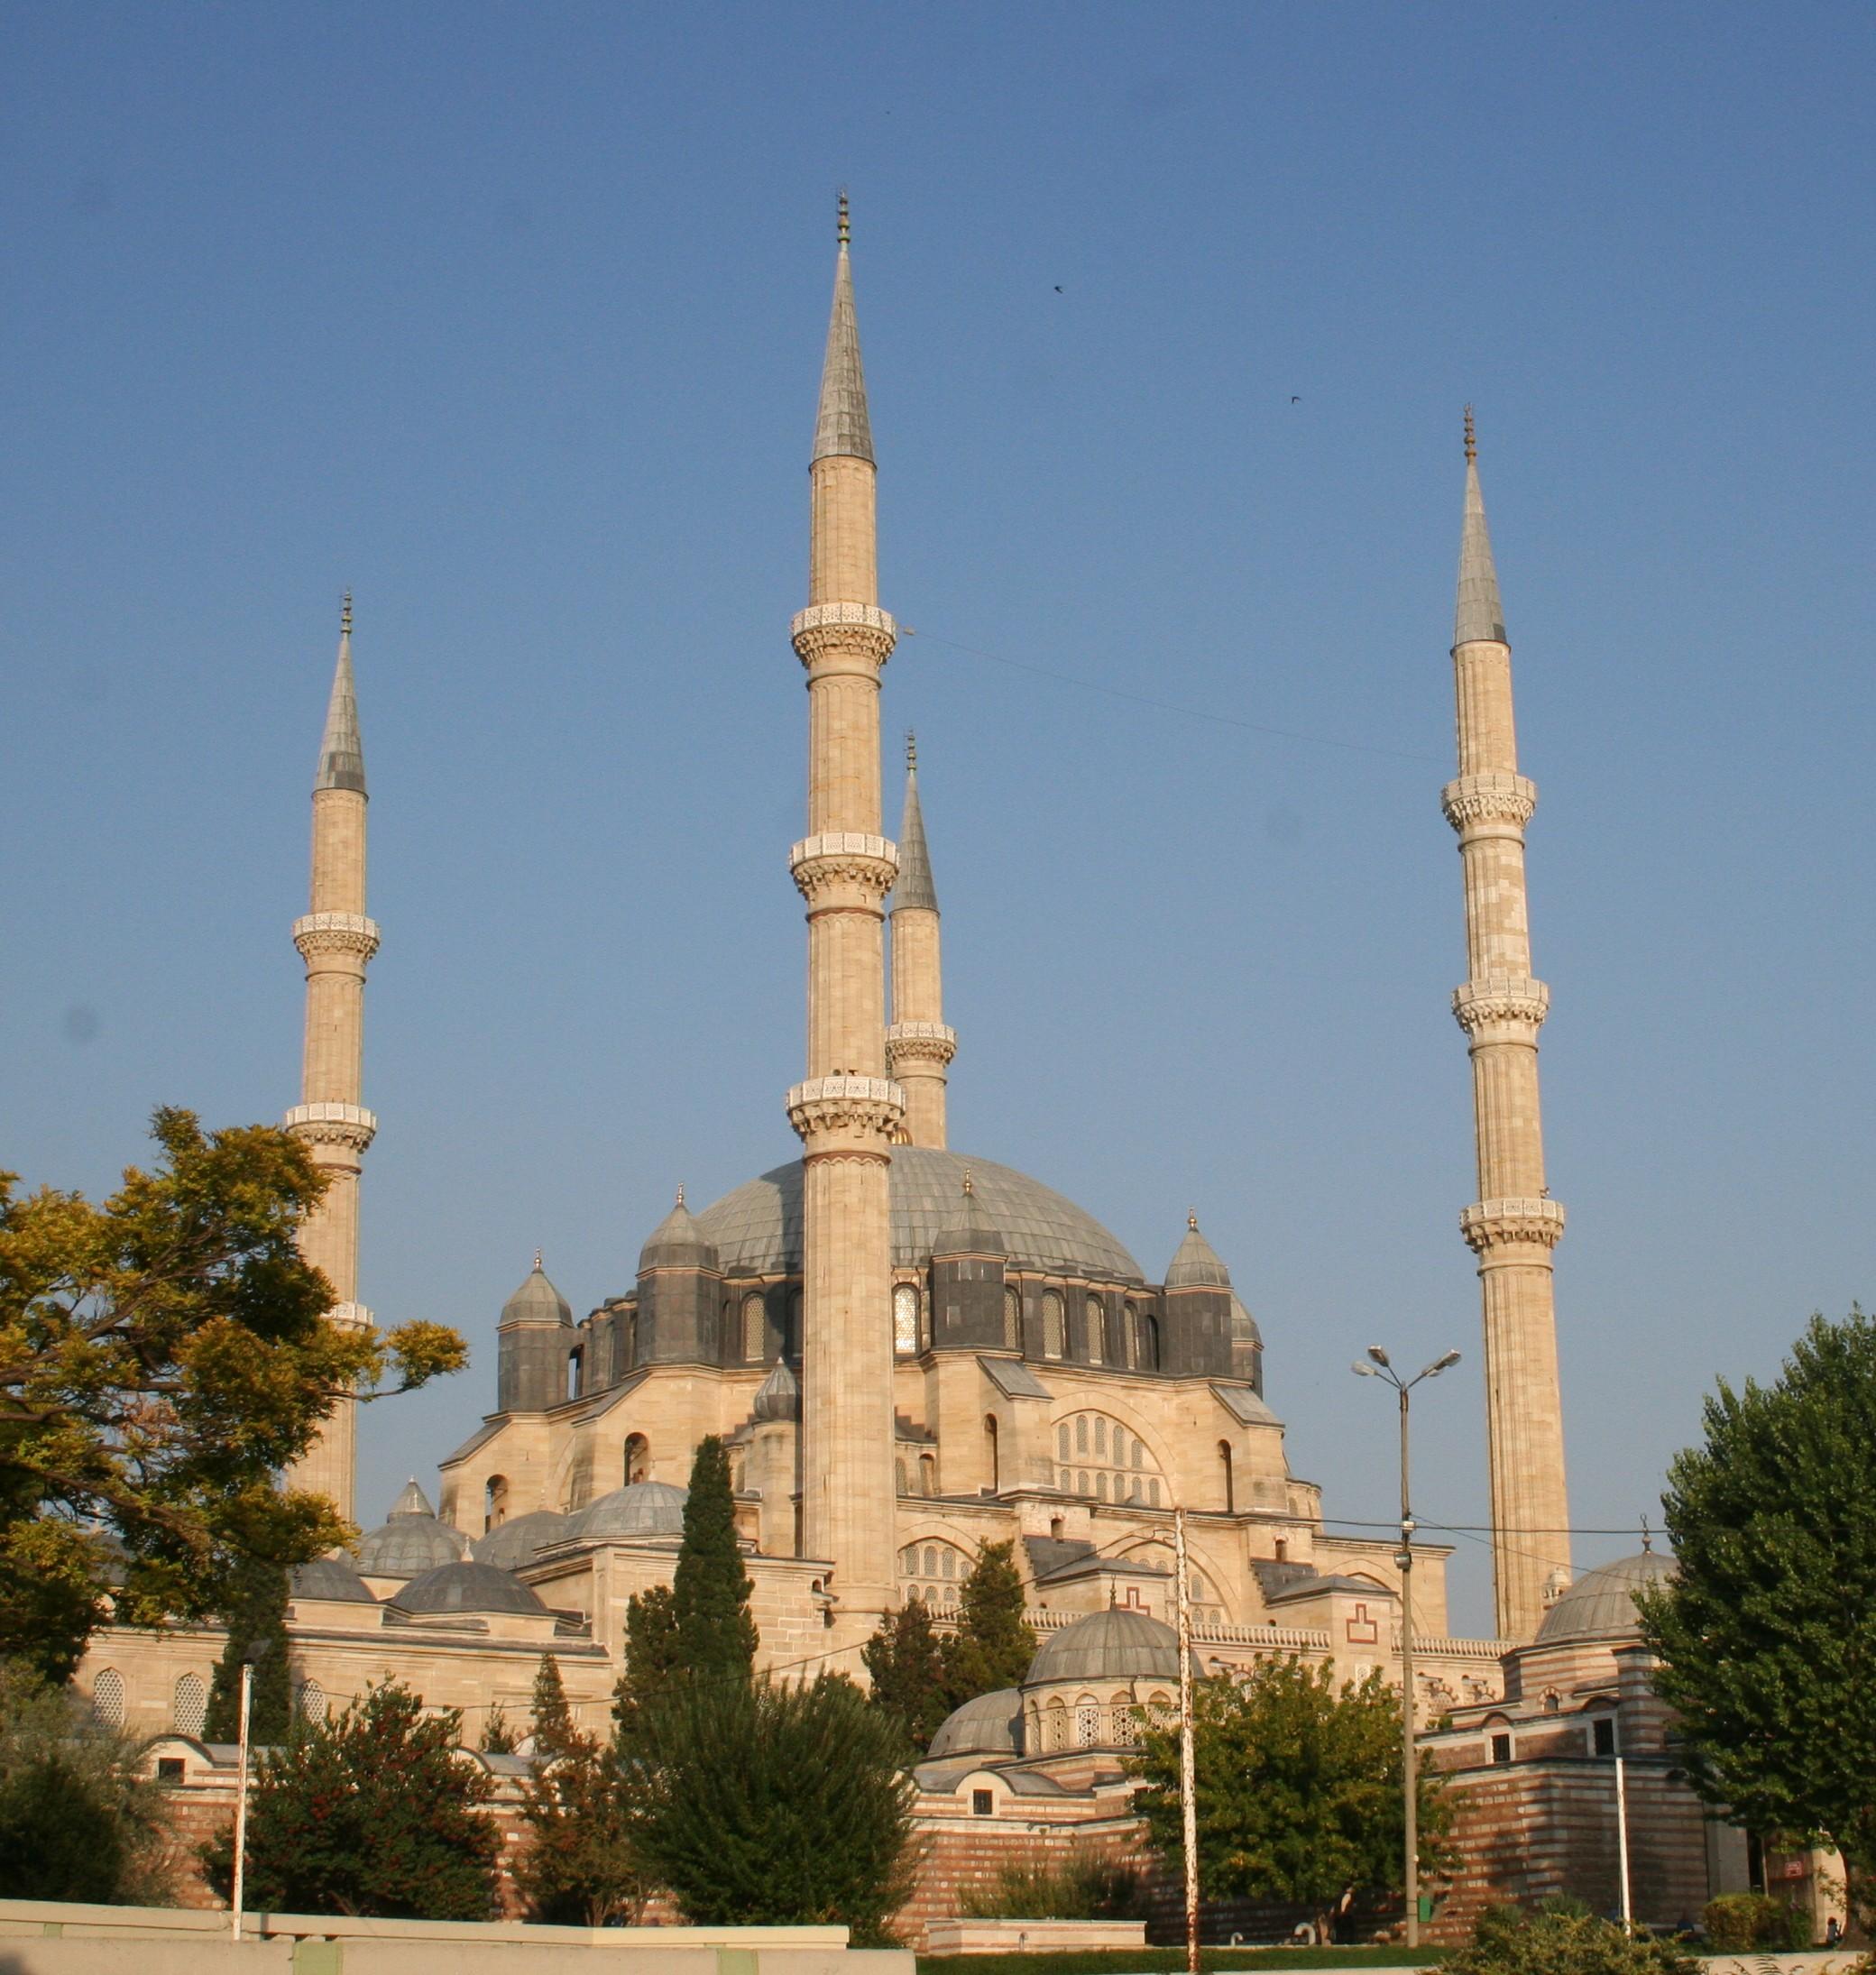 File:Selimiye camii.JPG - Wikimedia Commons